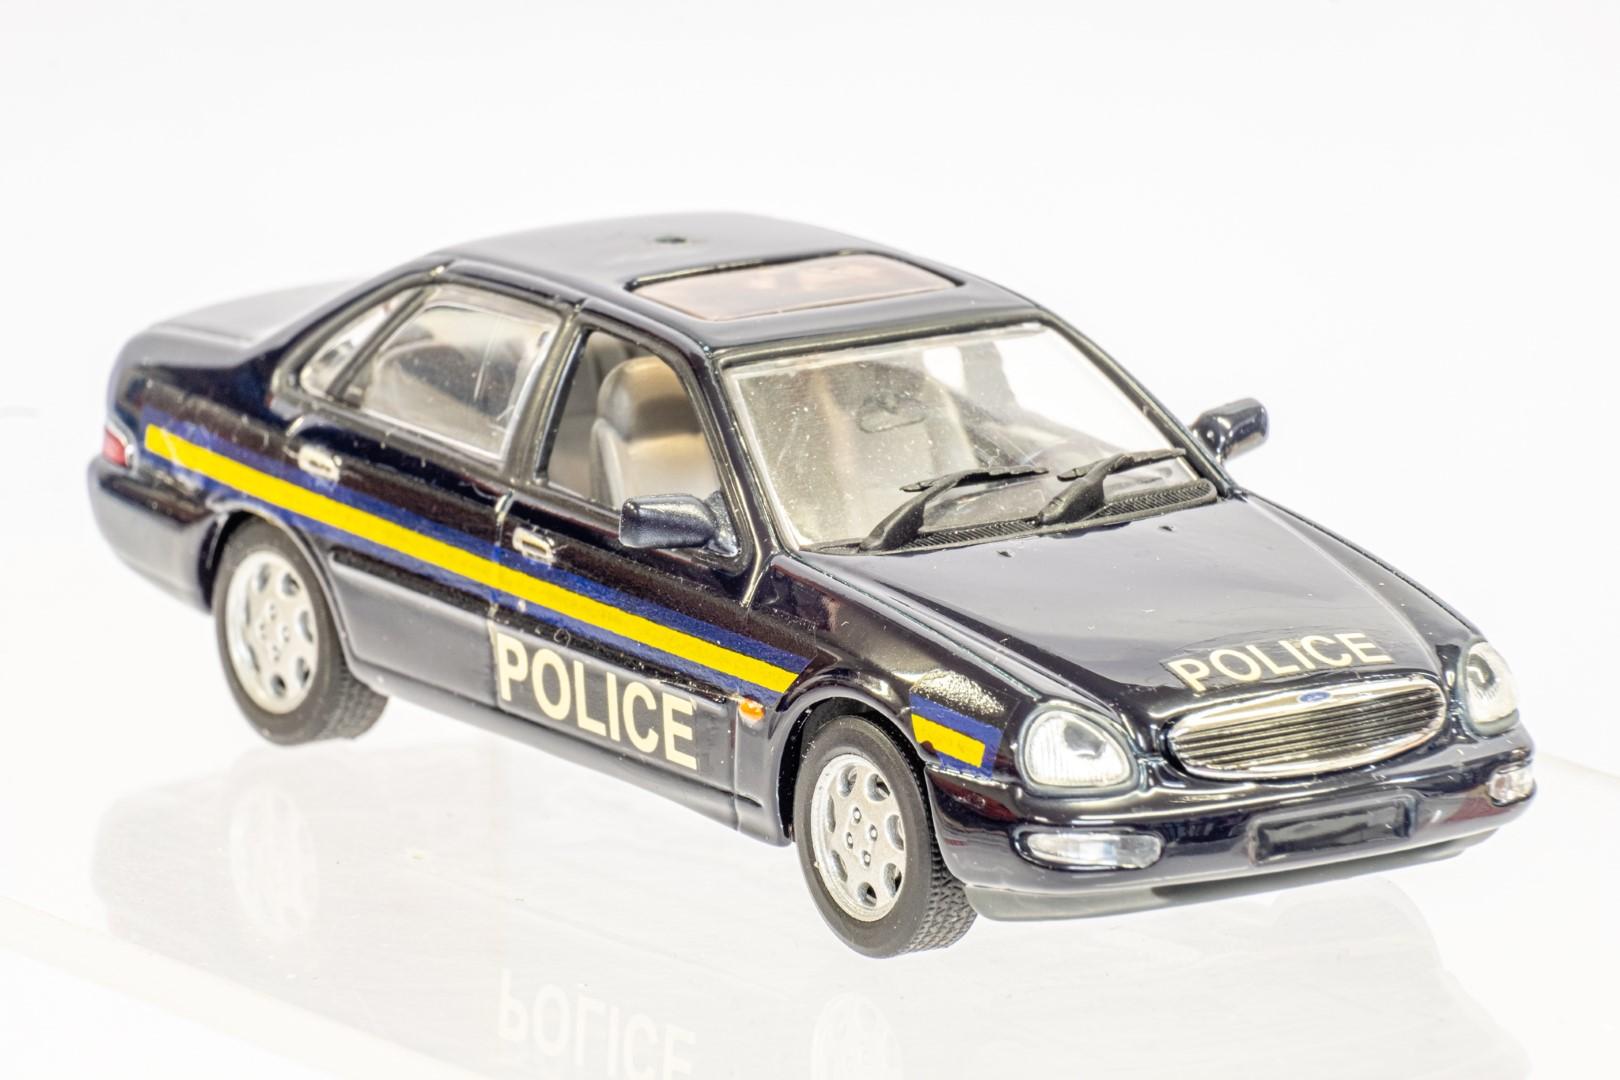 Automax Ford Granada - Police - Code 3 - Image 7 of 7